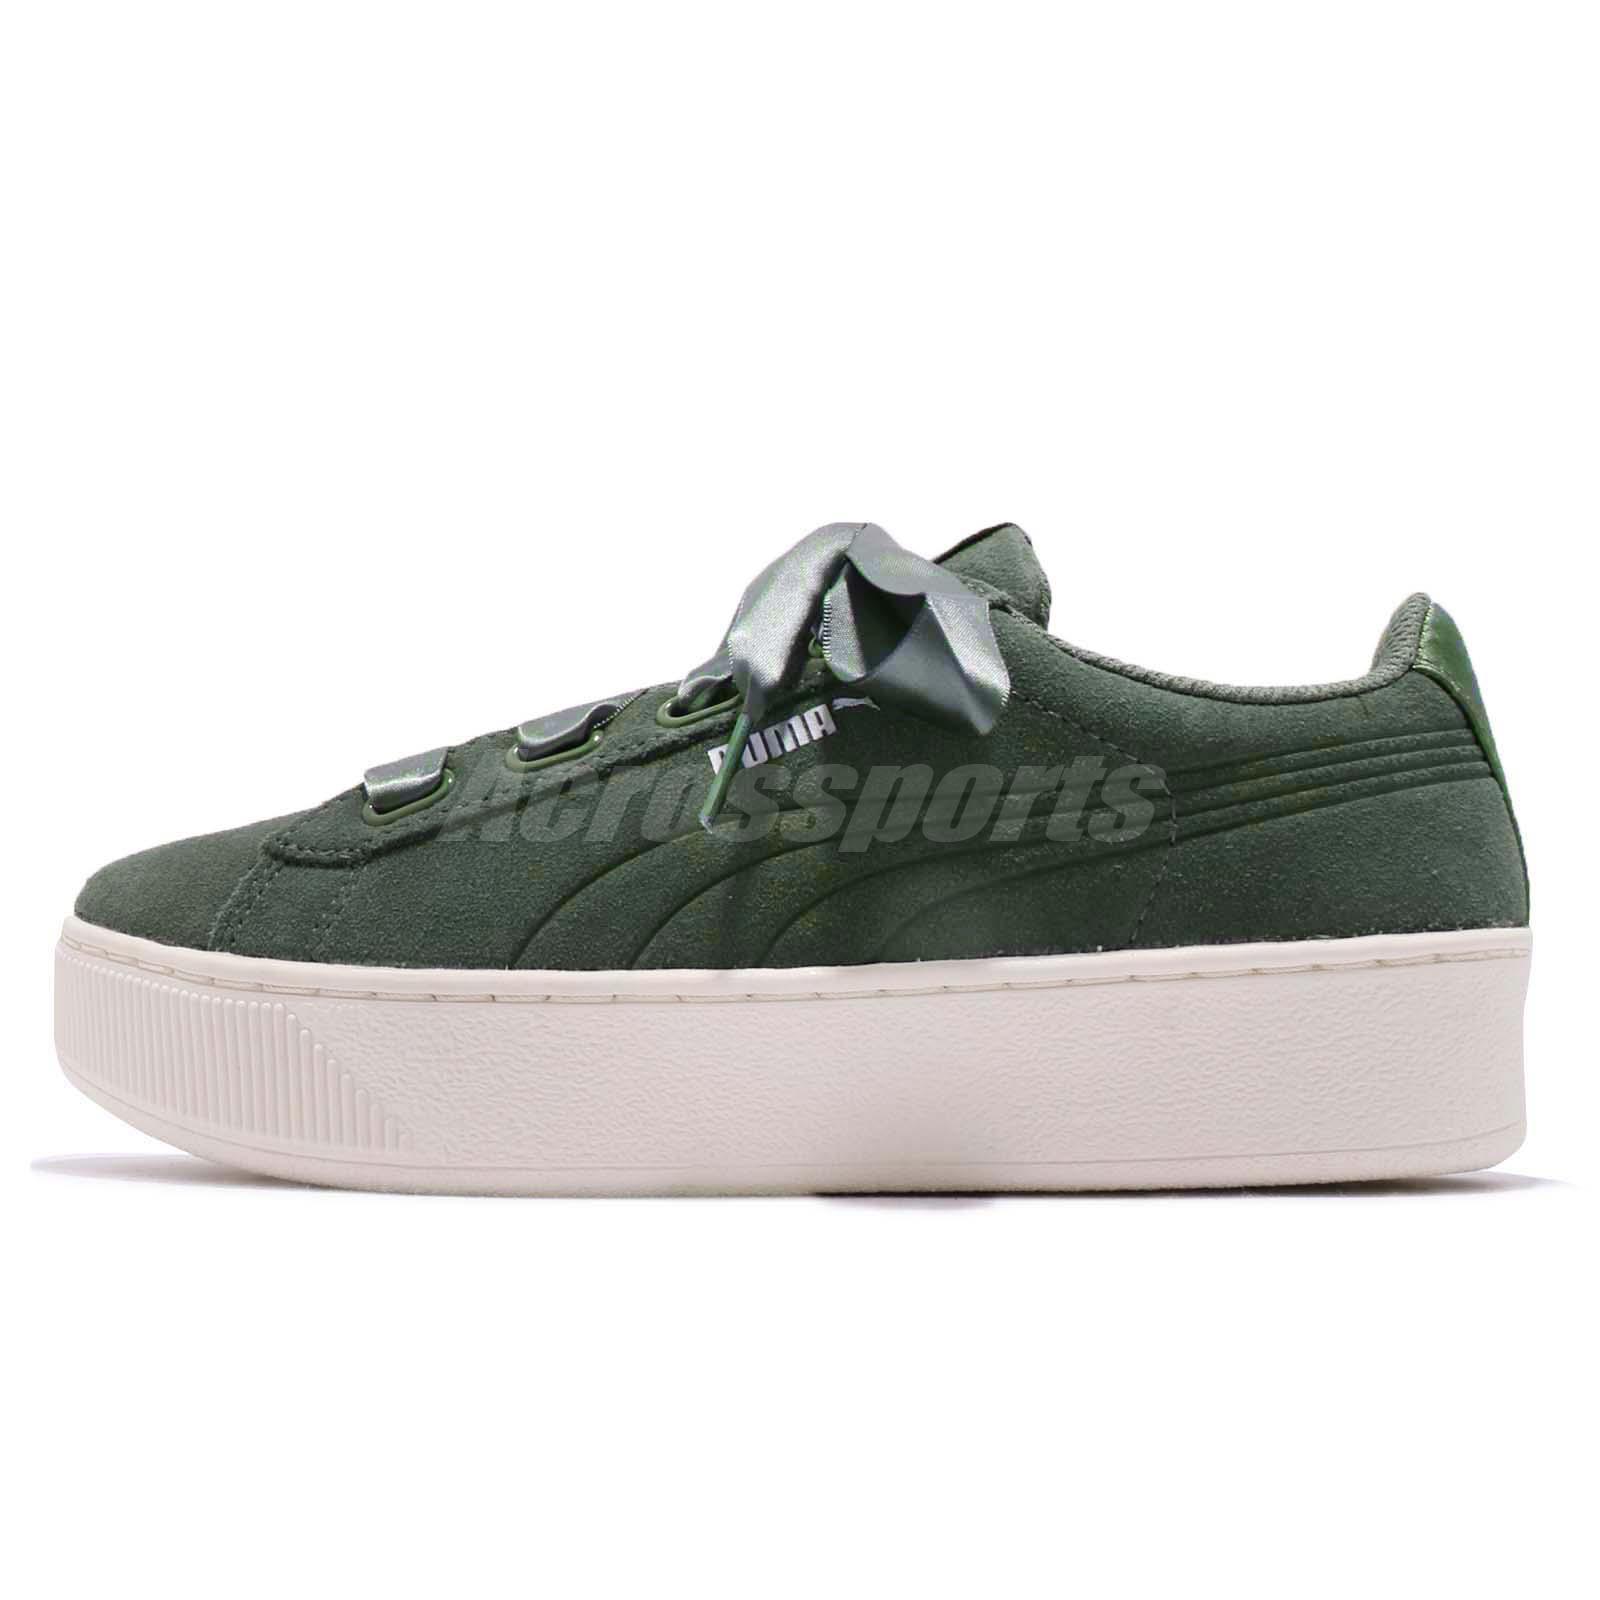 bee19888007082 Puma Vikky Platform Ribbon S Green White Women Casual Shoes Sneakers 366418 -05